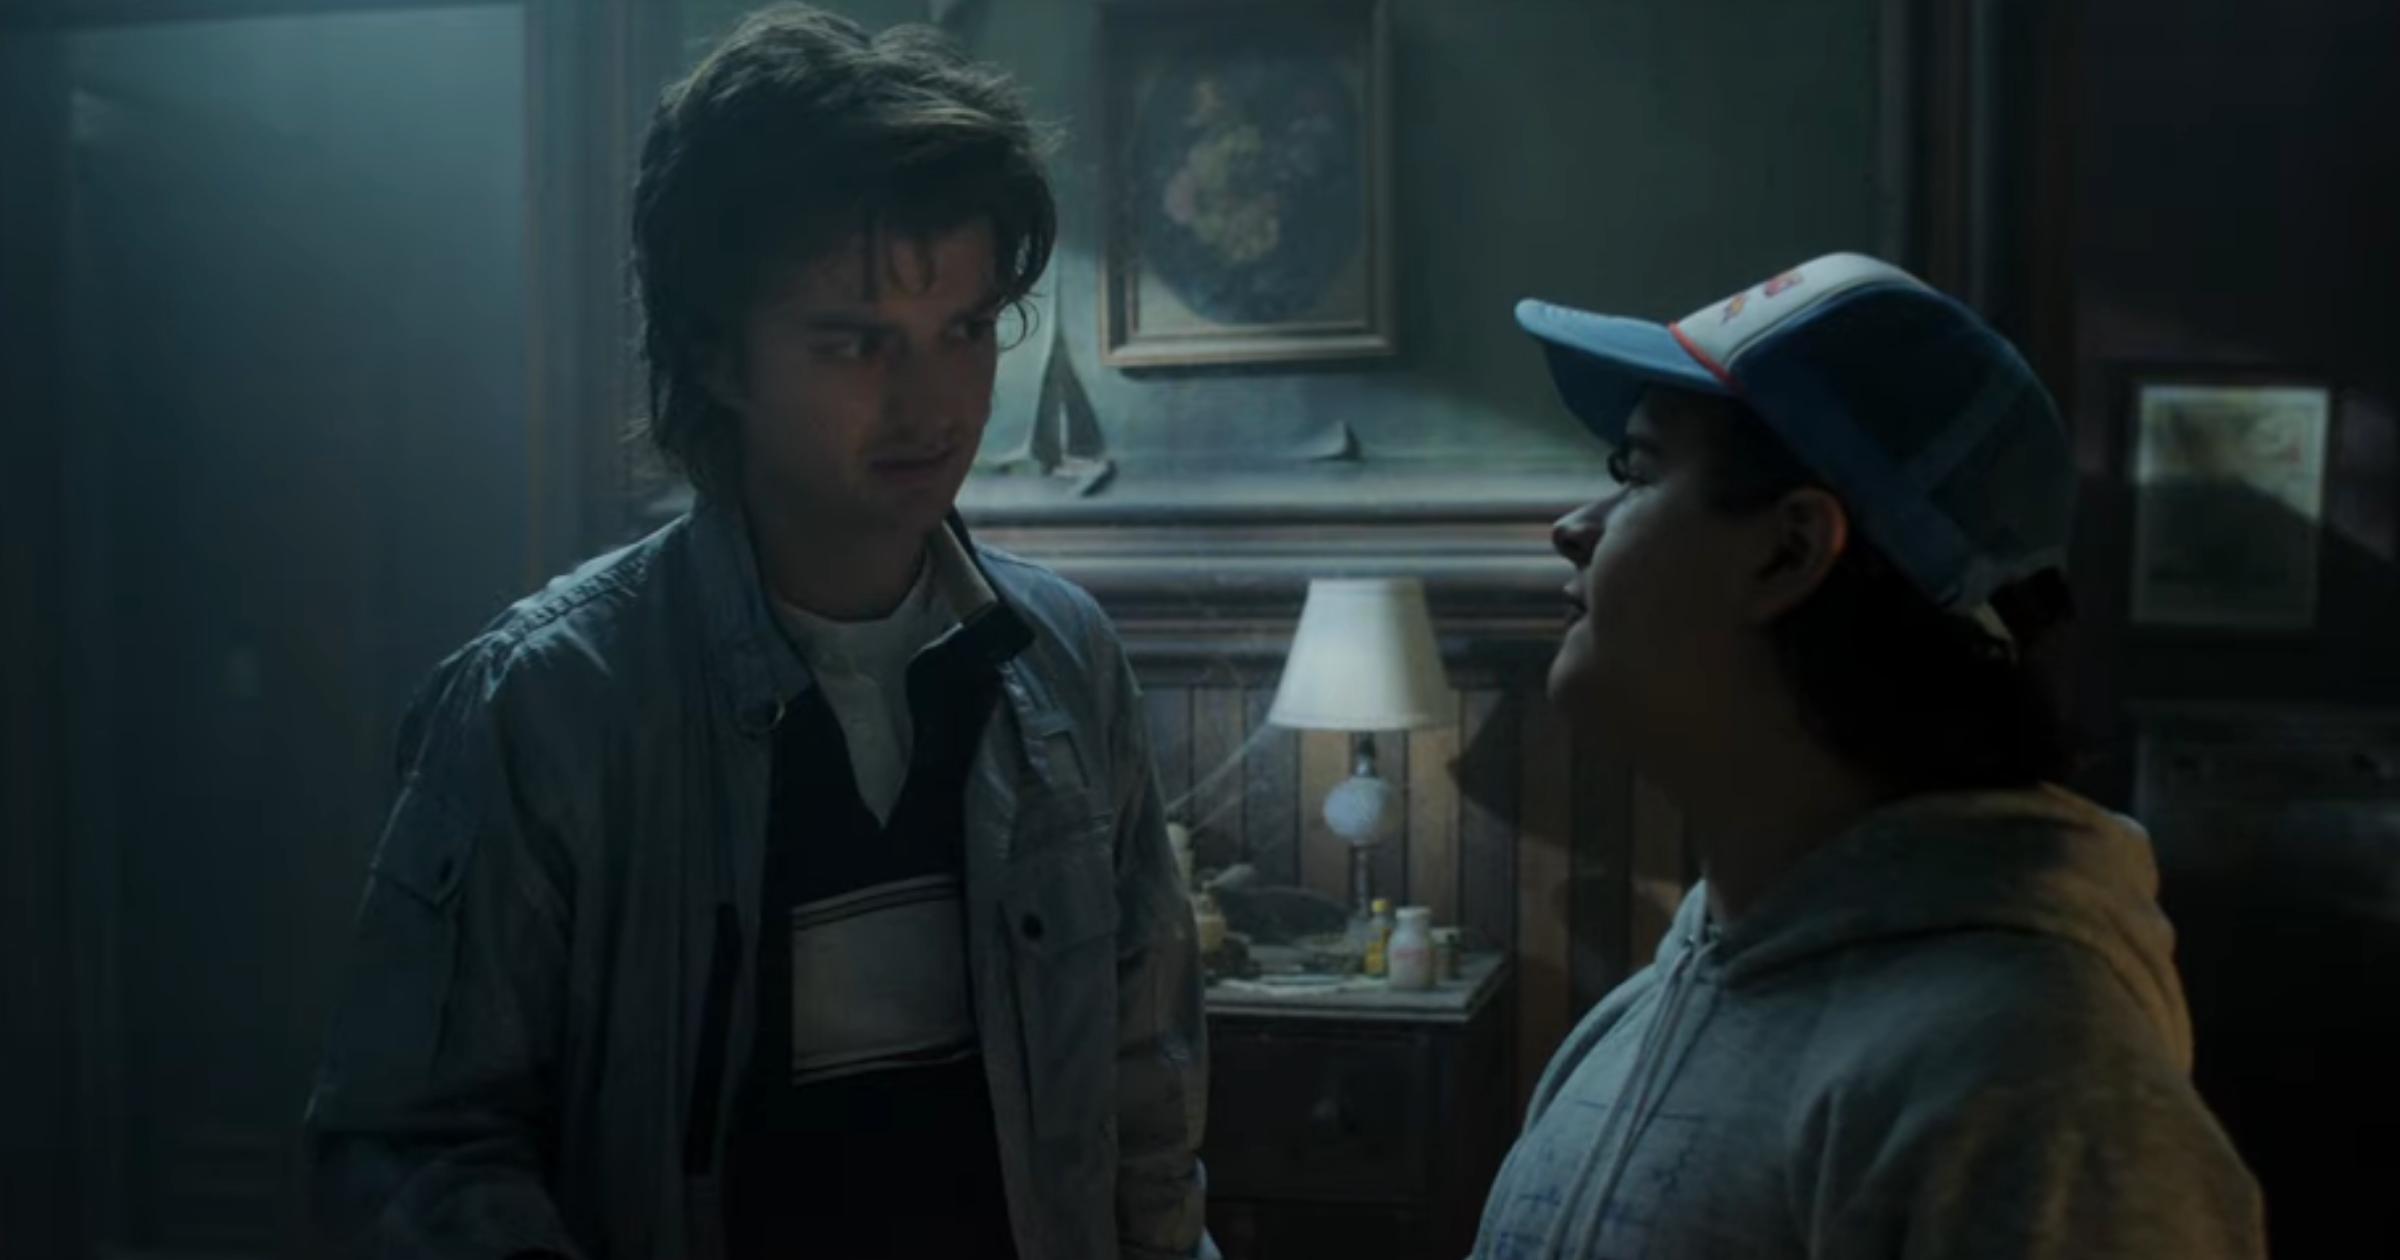 Netflix Drops 'Stranger Things' Season 4 Teaser With Premiere Details at TUDUM.jpg